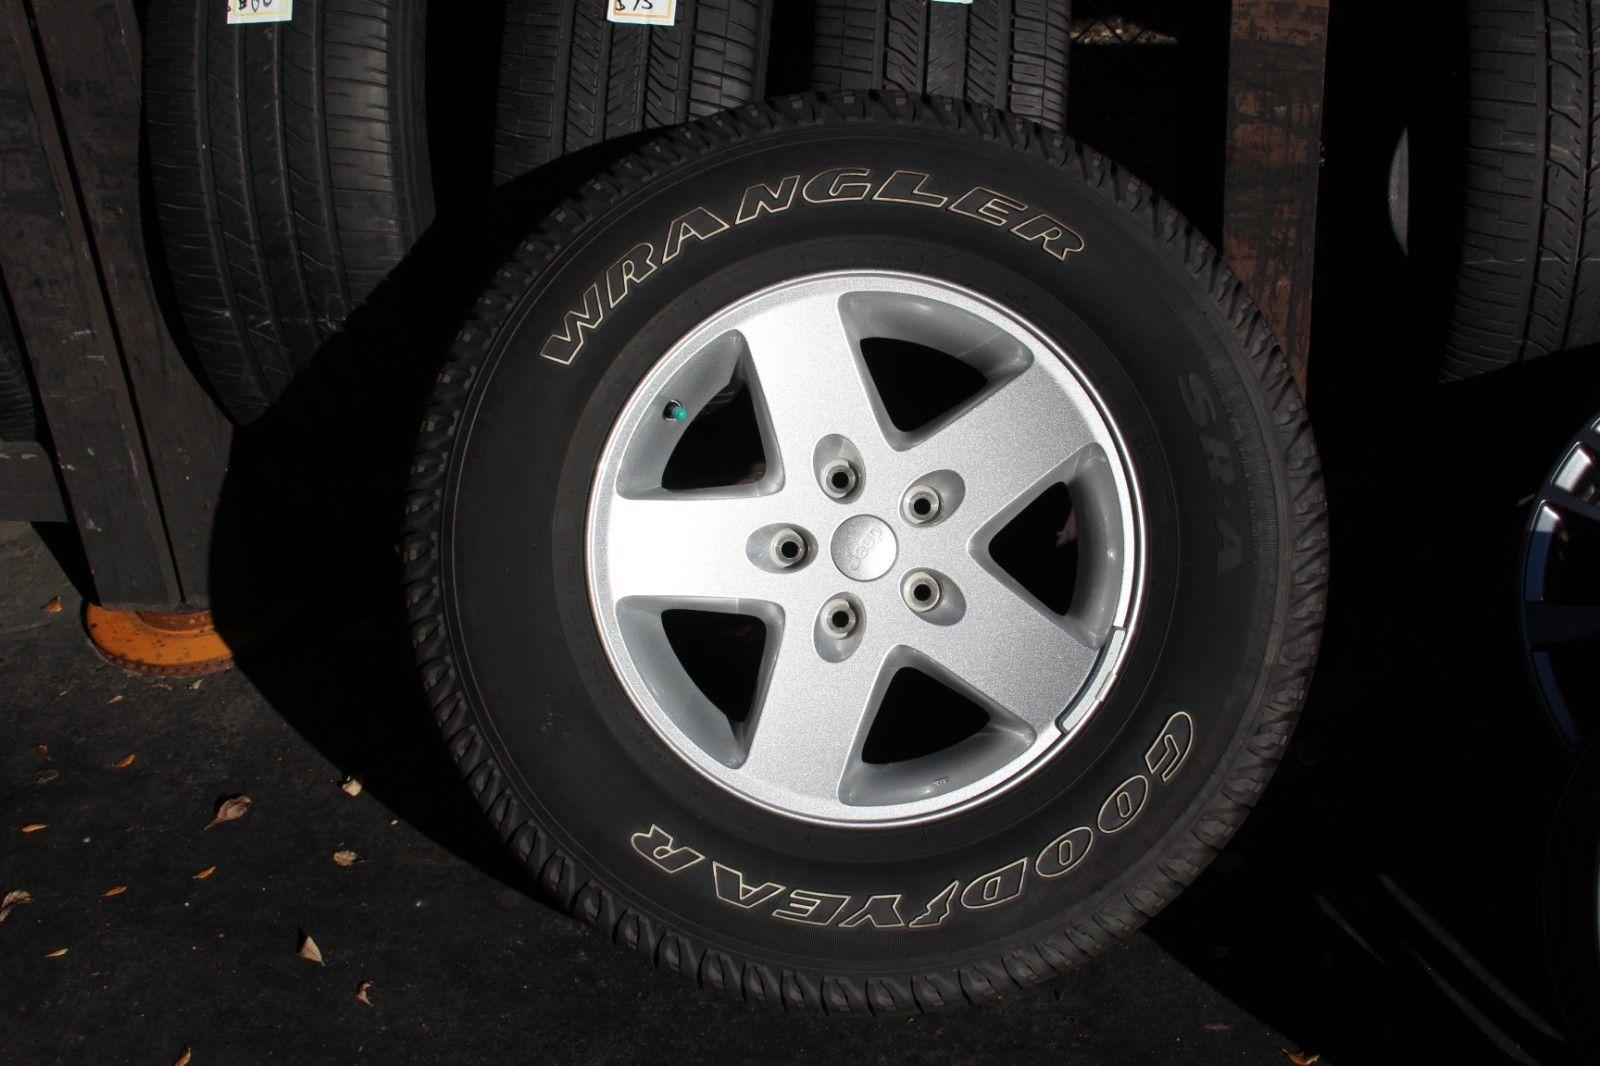 Jeep Wrangler 2010 2011 2012 2013 2014 2015 17 Oem Rim 245 75 17 Tire 9074 Alloemrims Com